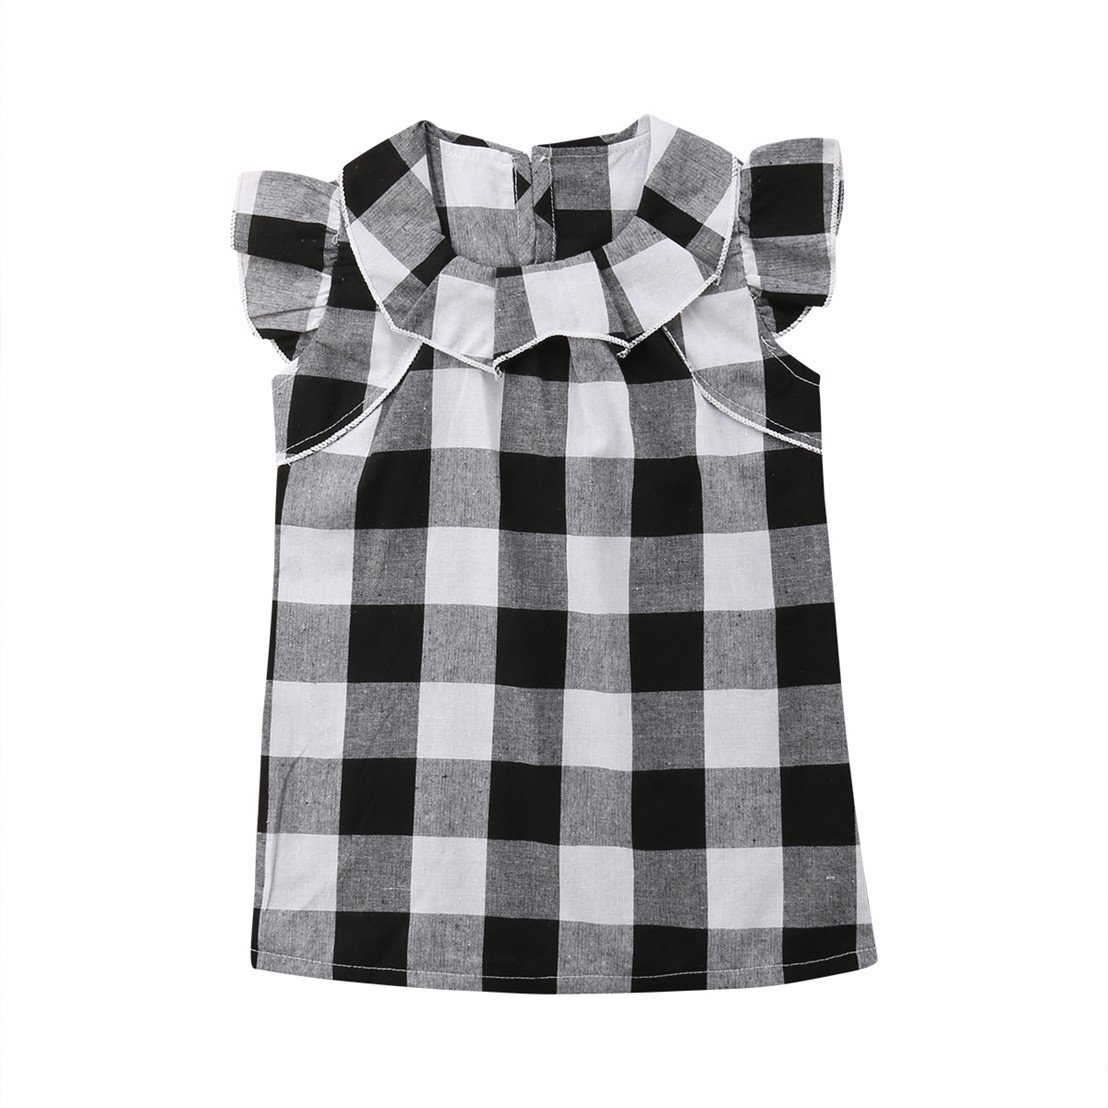 Mornbaby DRESS ベビーガールズ 4Years ホワイト/ブラック B07D9CCMX4